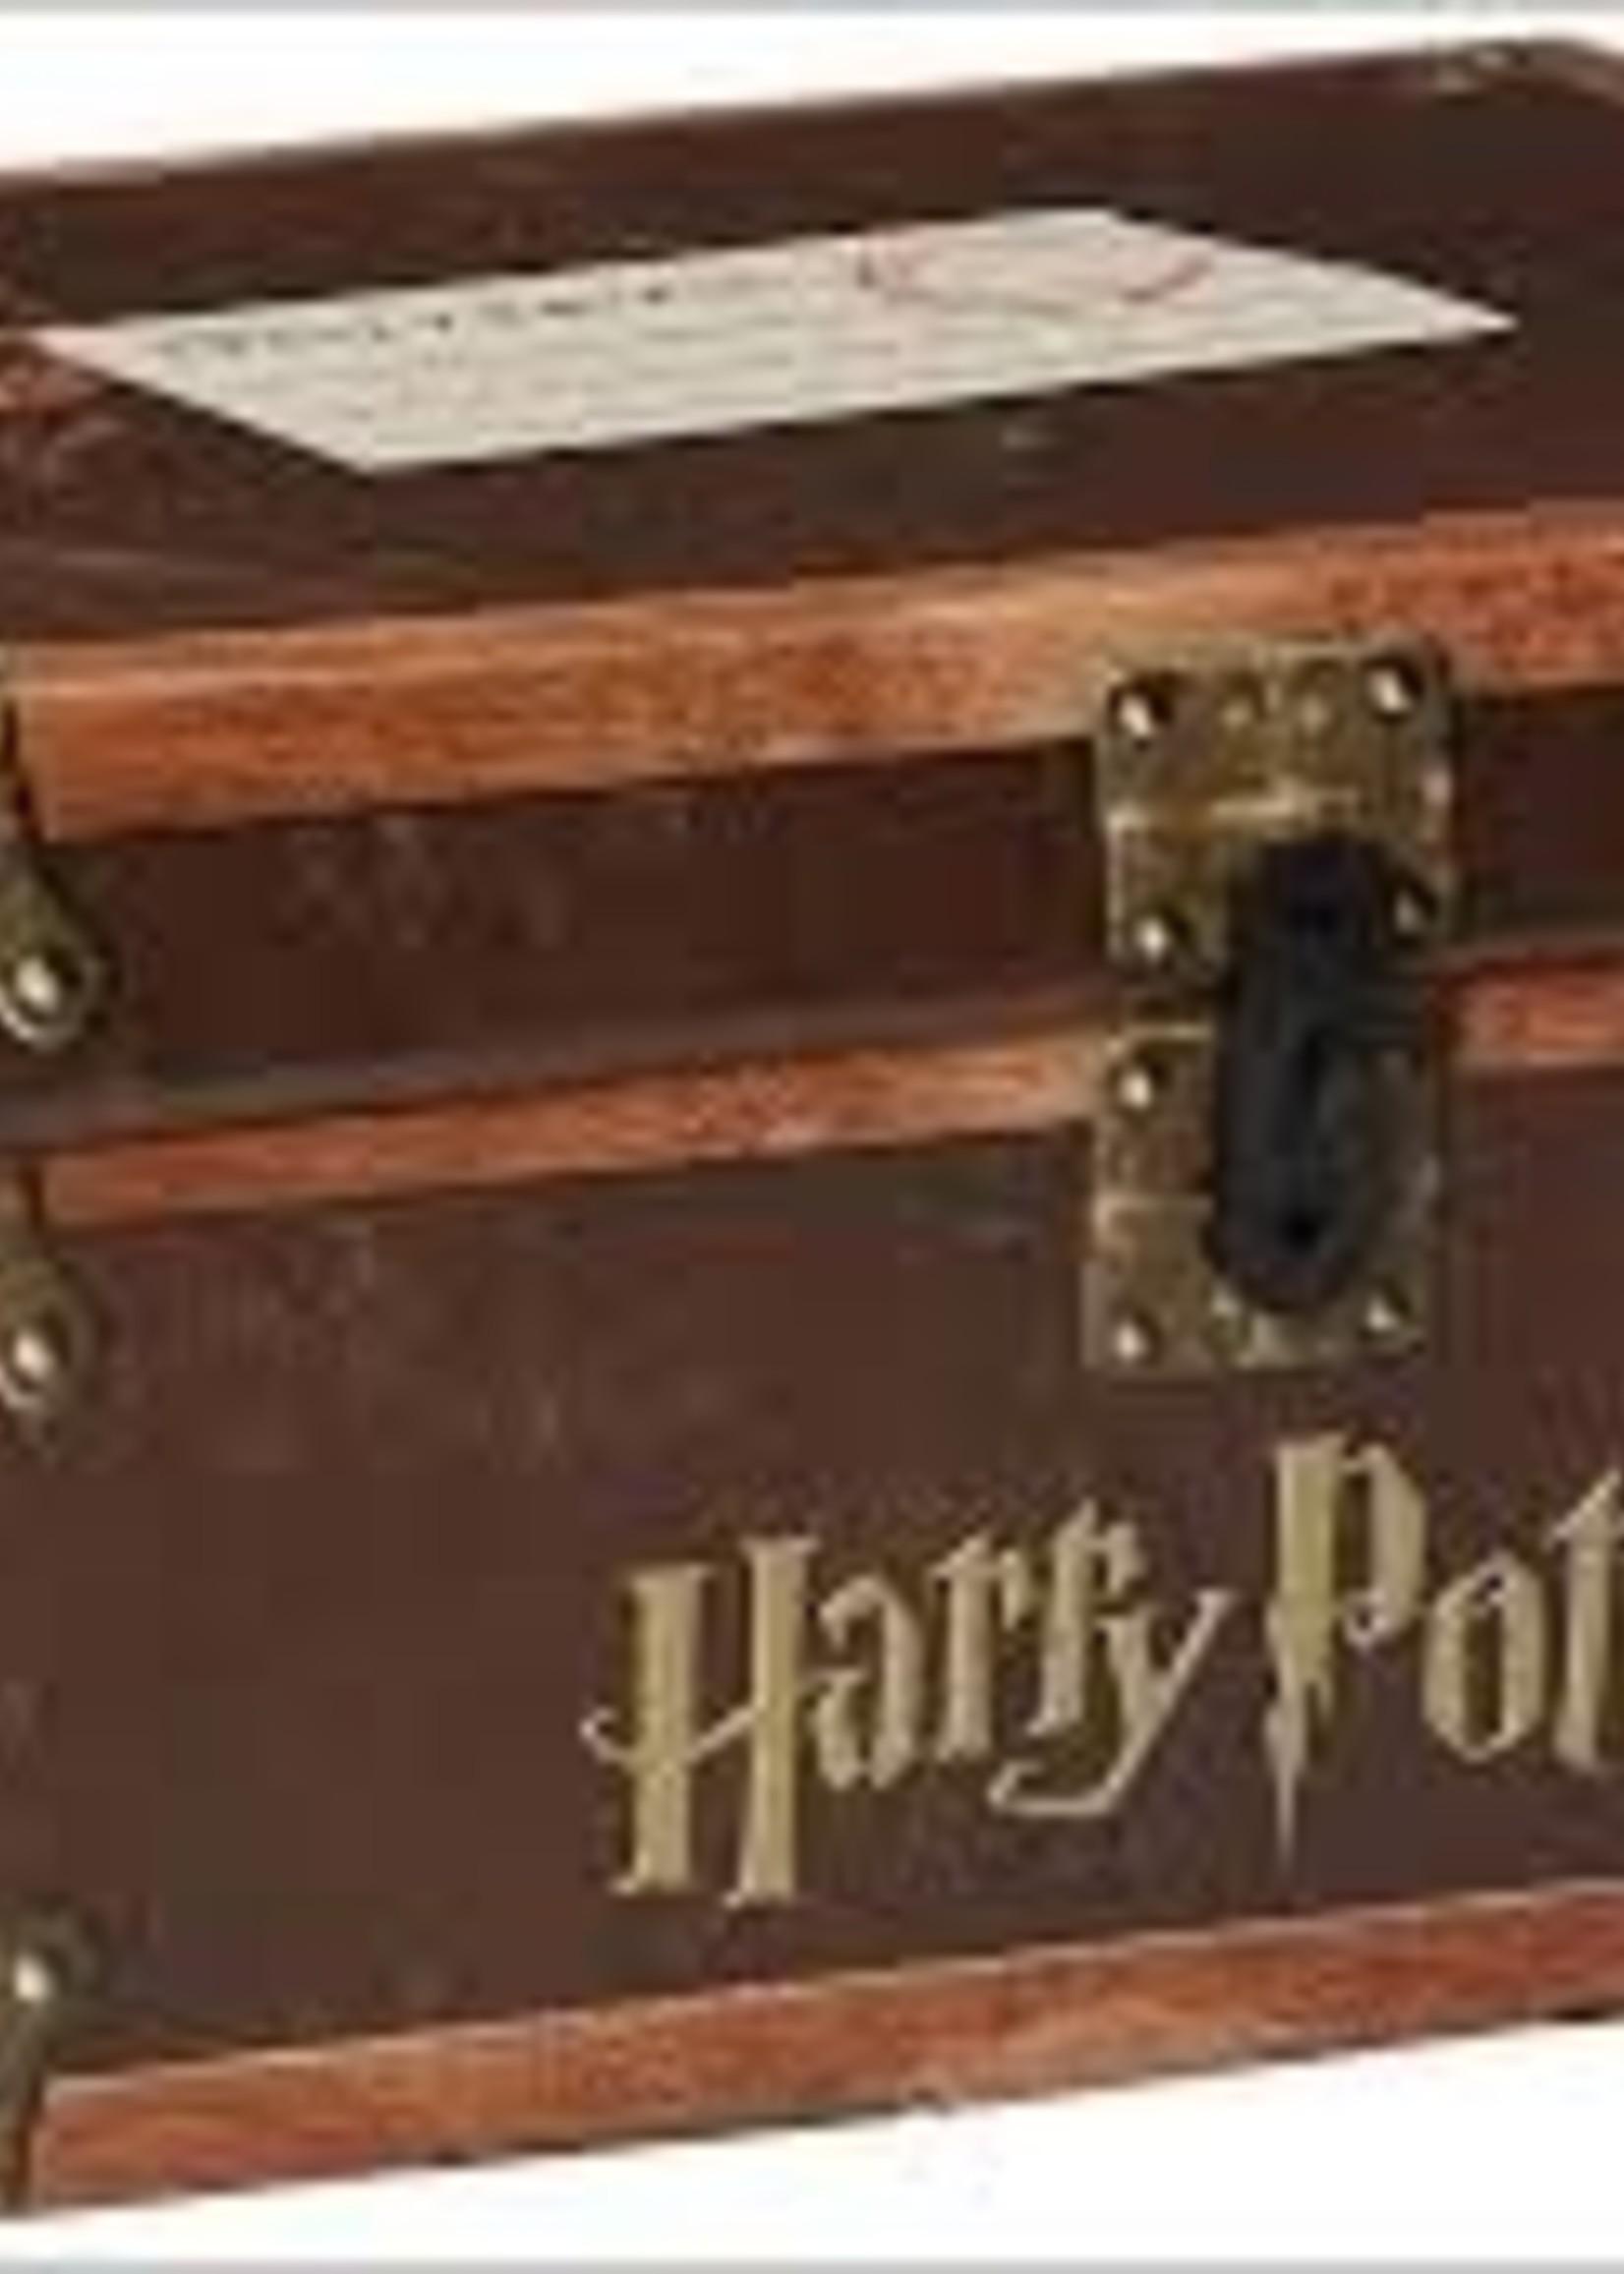 Harry Potter HC Book Set, #01-07 - Box